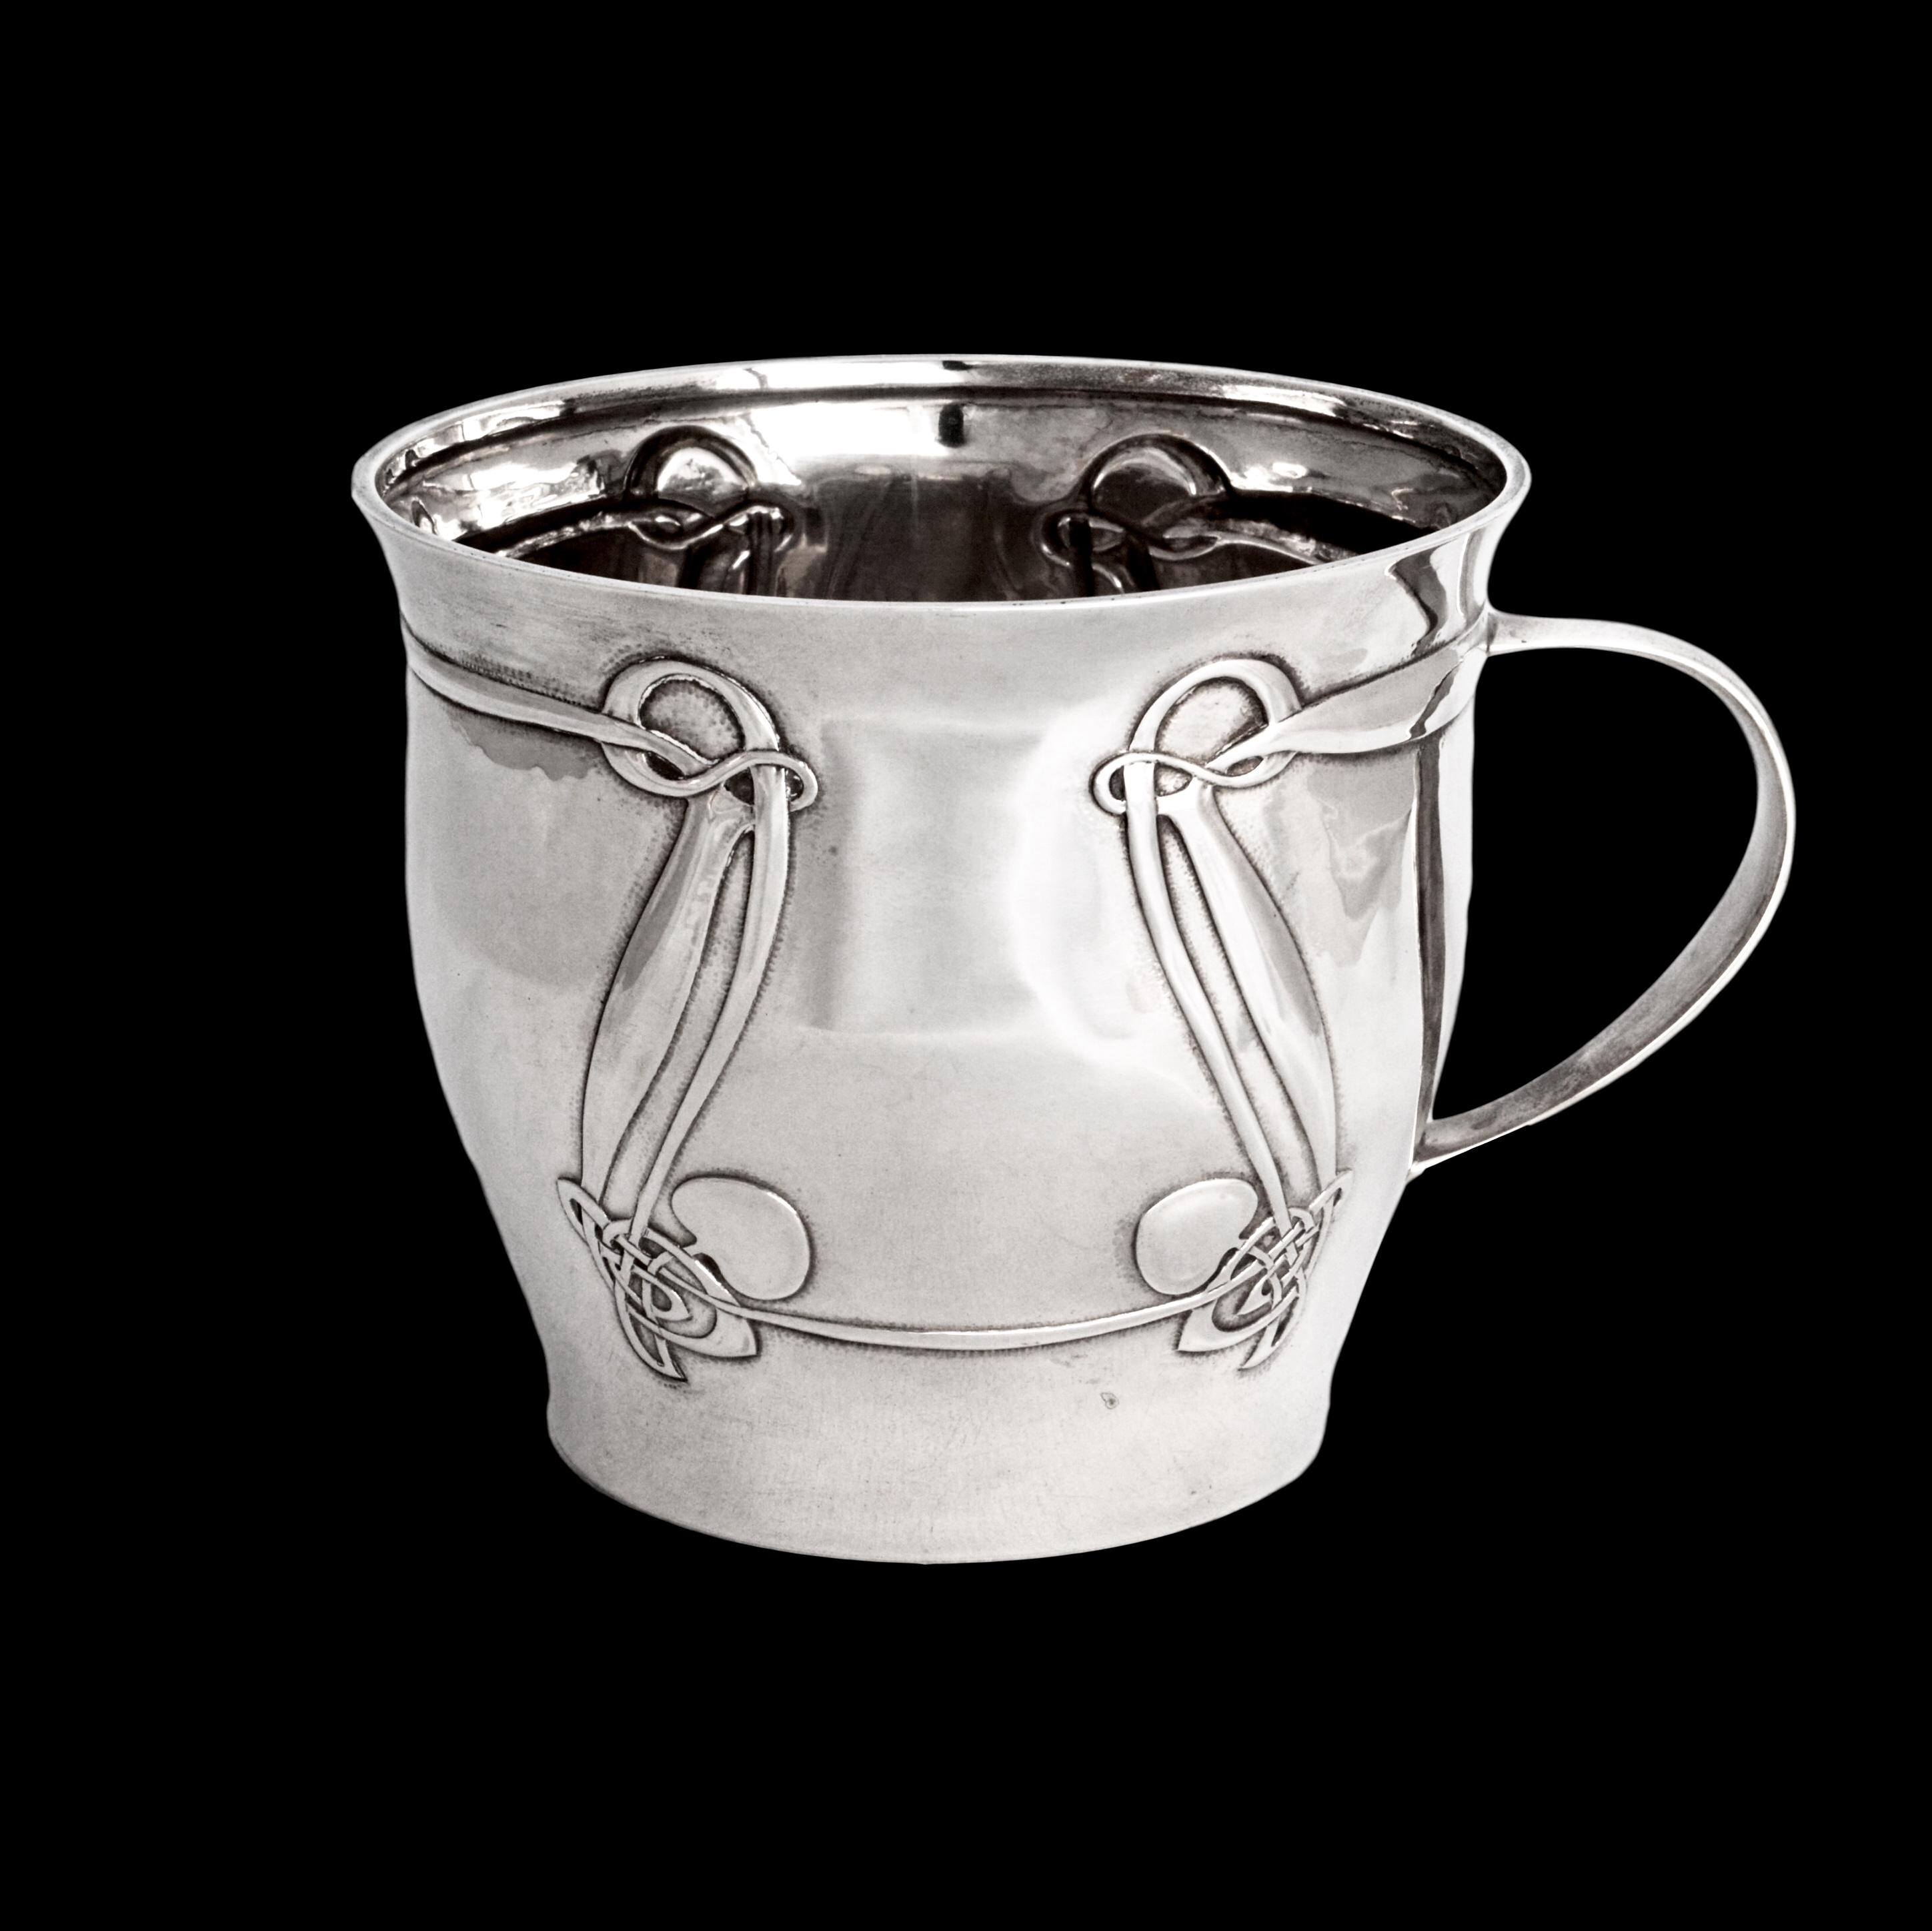 Archibald Knox silver, Liberty Cymric silver